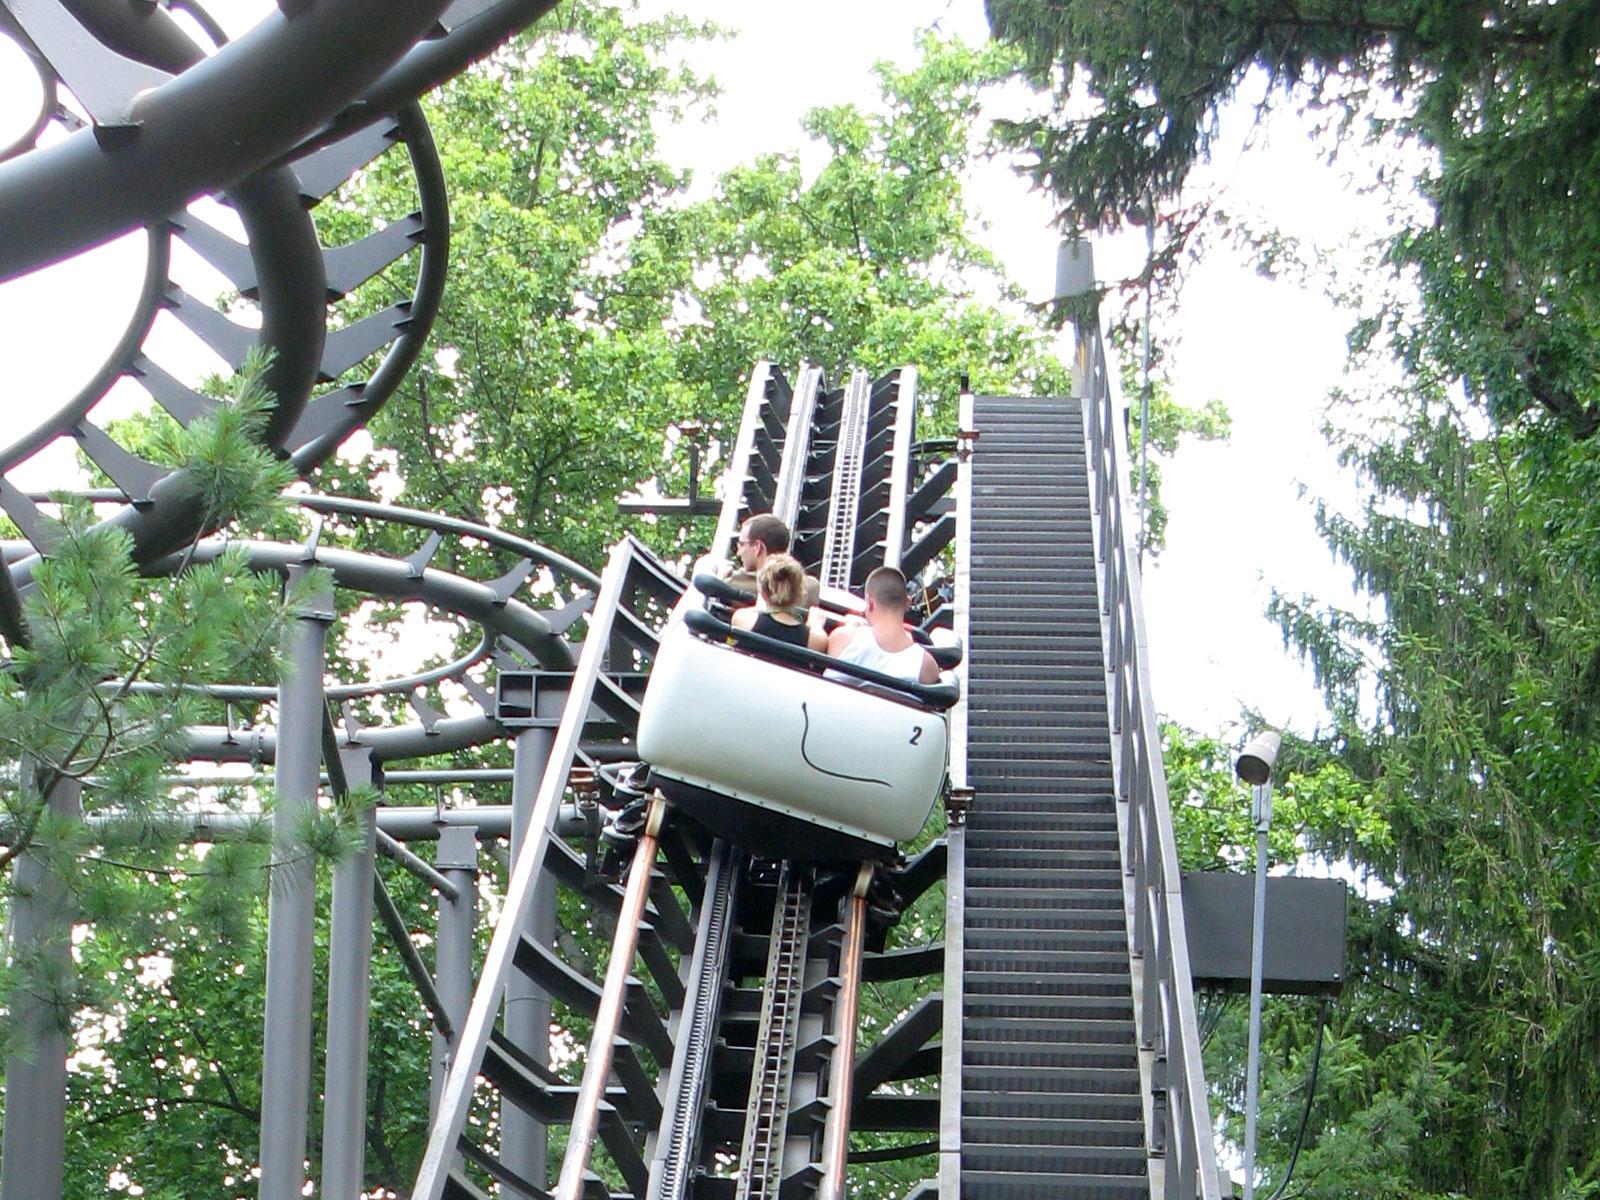 Coaster Trips 2009 Idlewild Kennywood Park 1600x1200